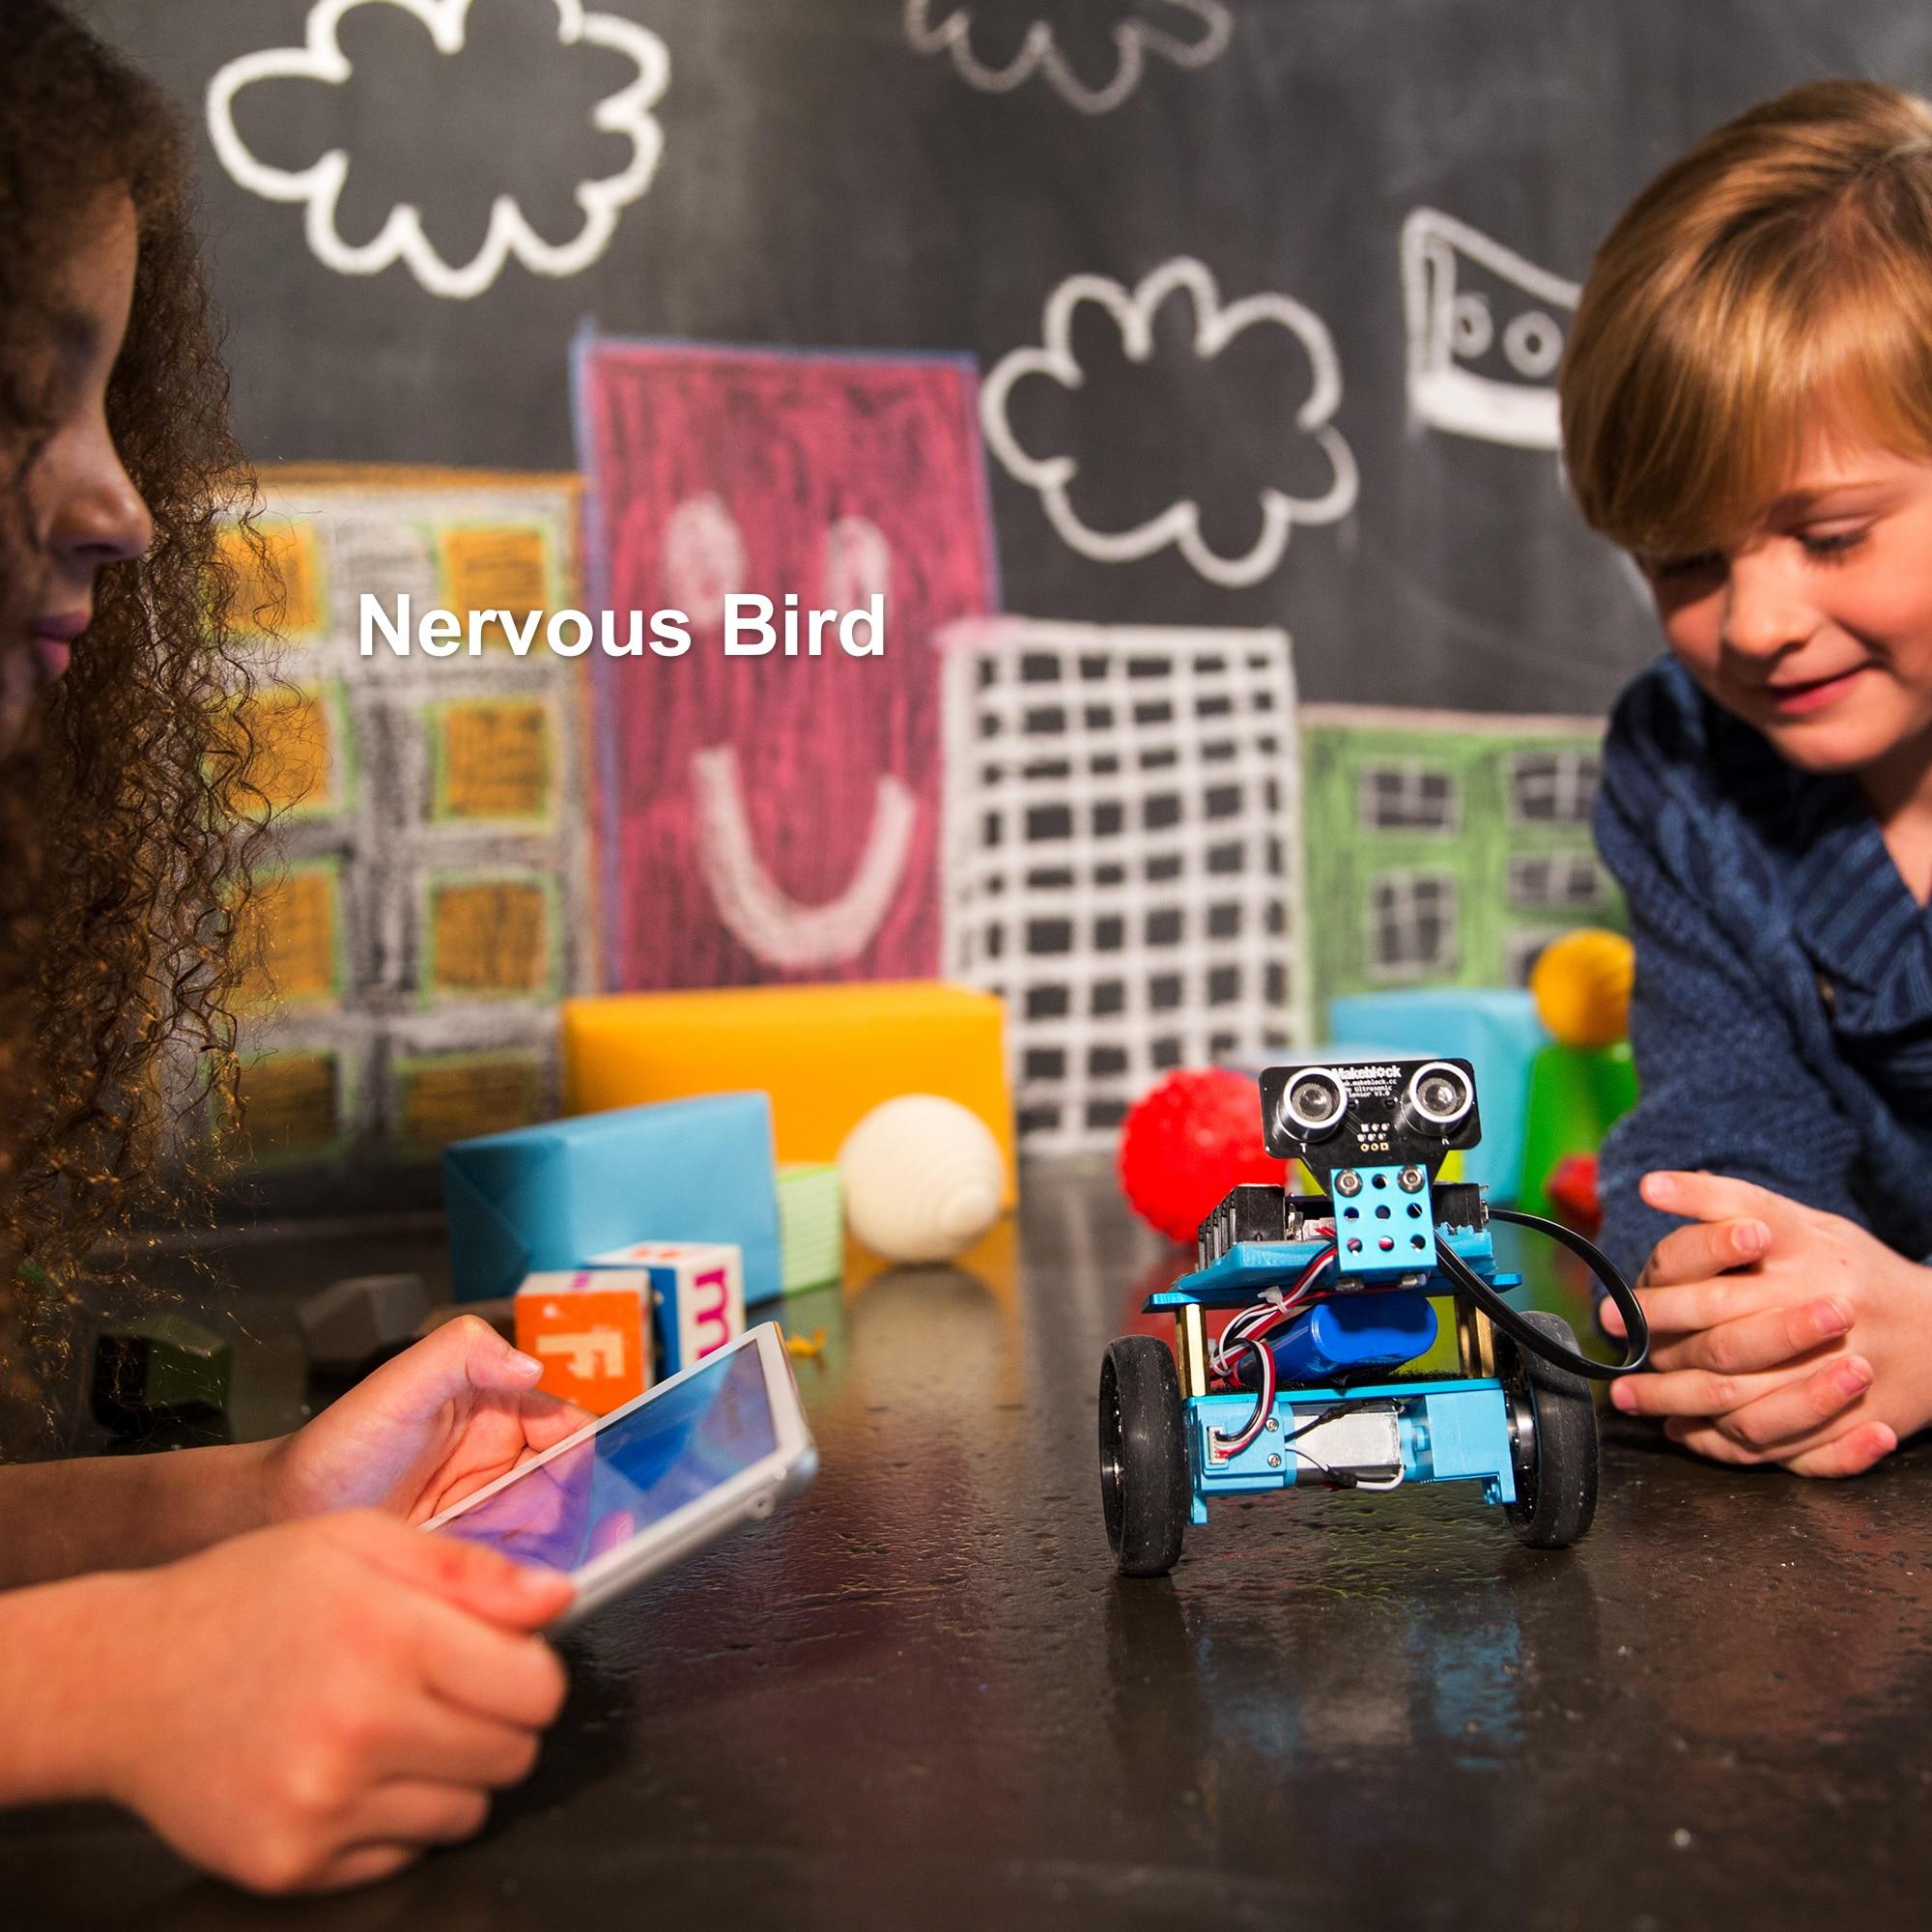 Makeblock Programmable mBot Ranger Robot Kit, Arduino,STEM Education, 3 in 1 Programmable Robotic for Kids, Age 12+ 4